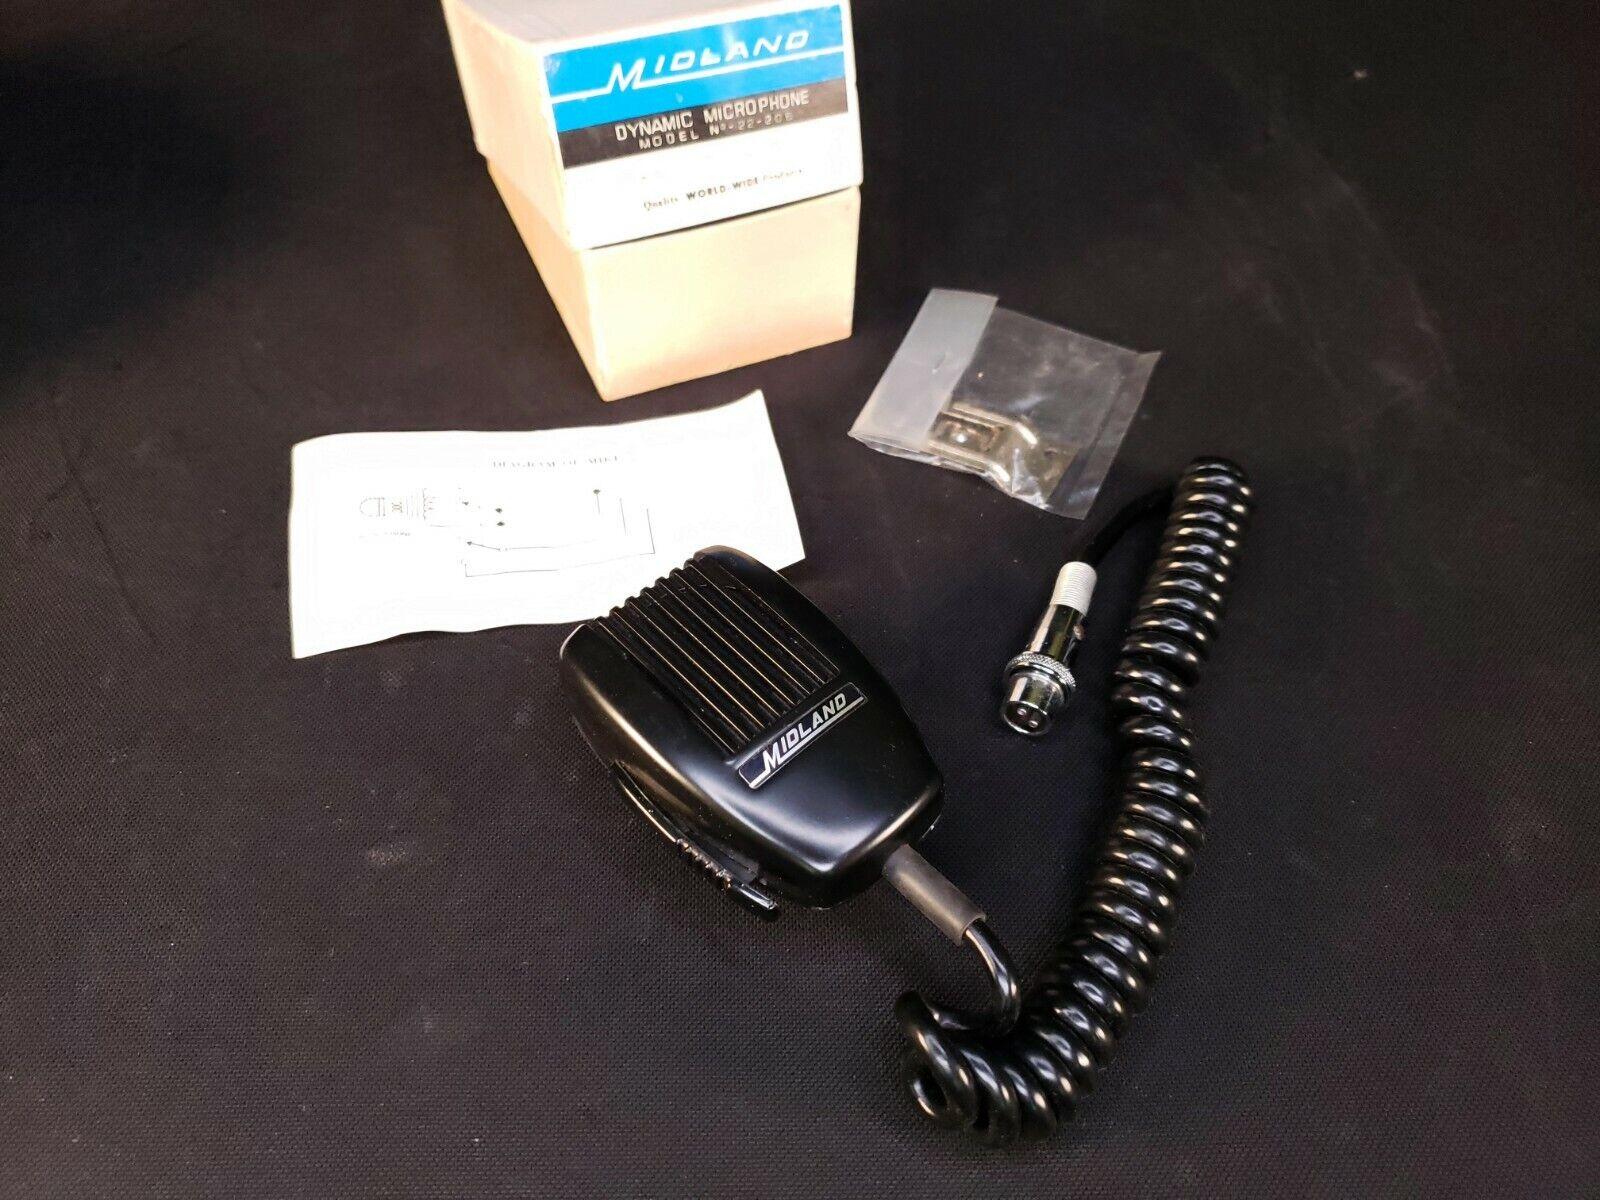 22-206 high_tech_stuff Vintage Midland Dynamic Microphone Model 22-206 CB PTT Mic - NEW OLD STOCK